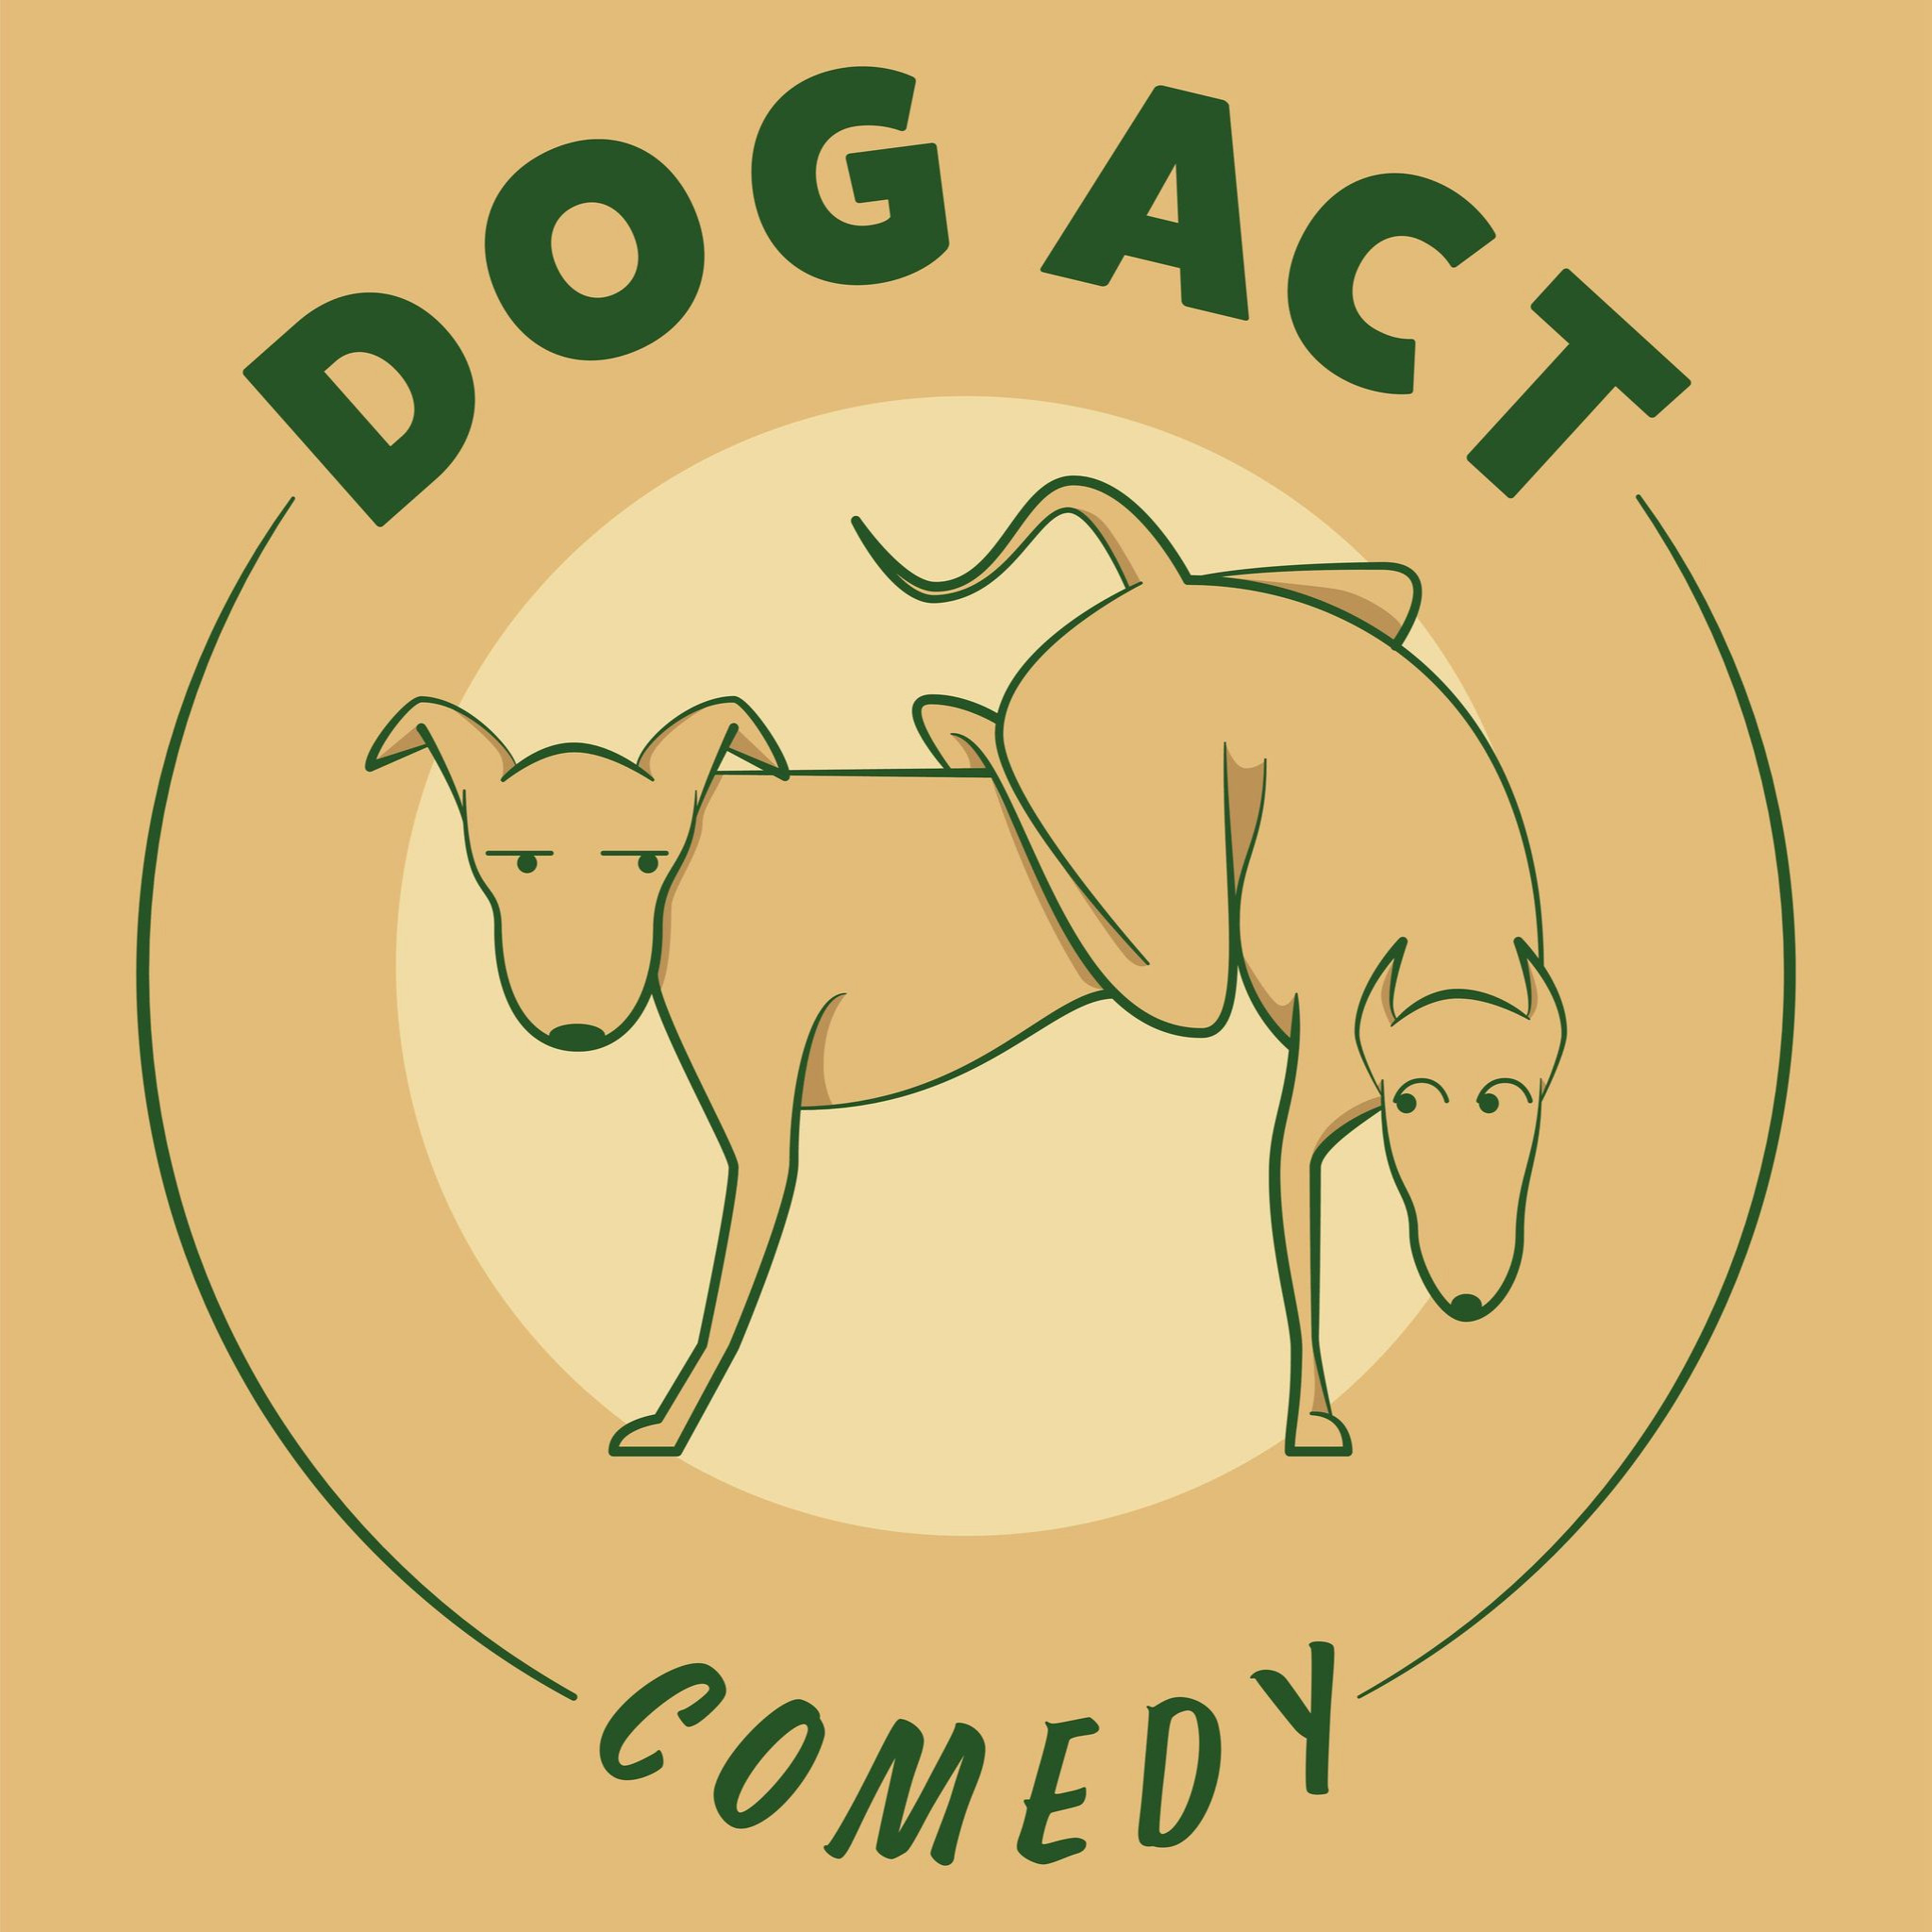 Dog Act Comedy (dogactcomedy) Profile Image | Linktree